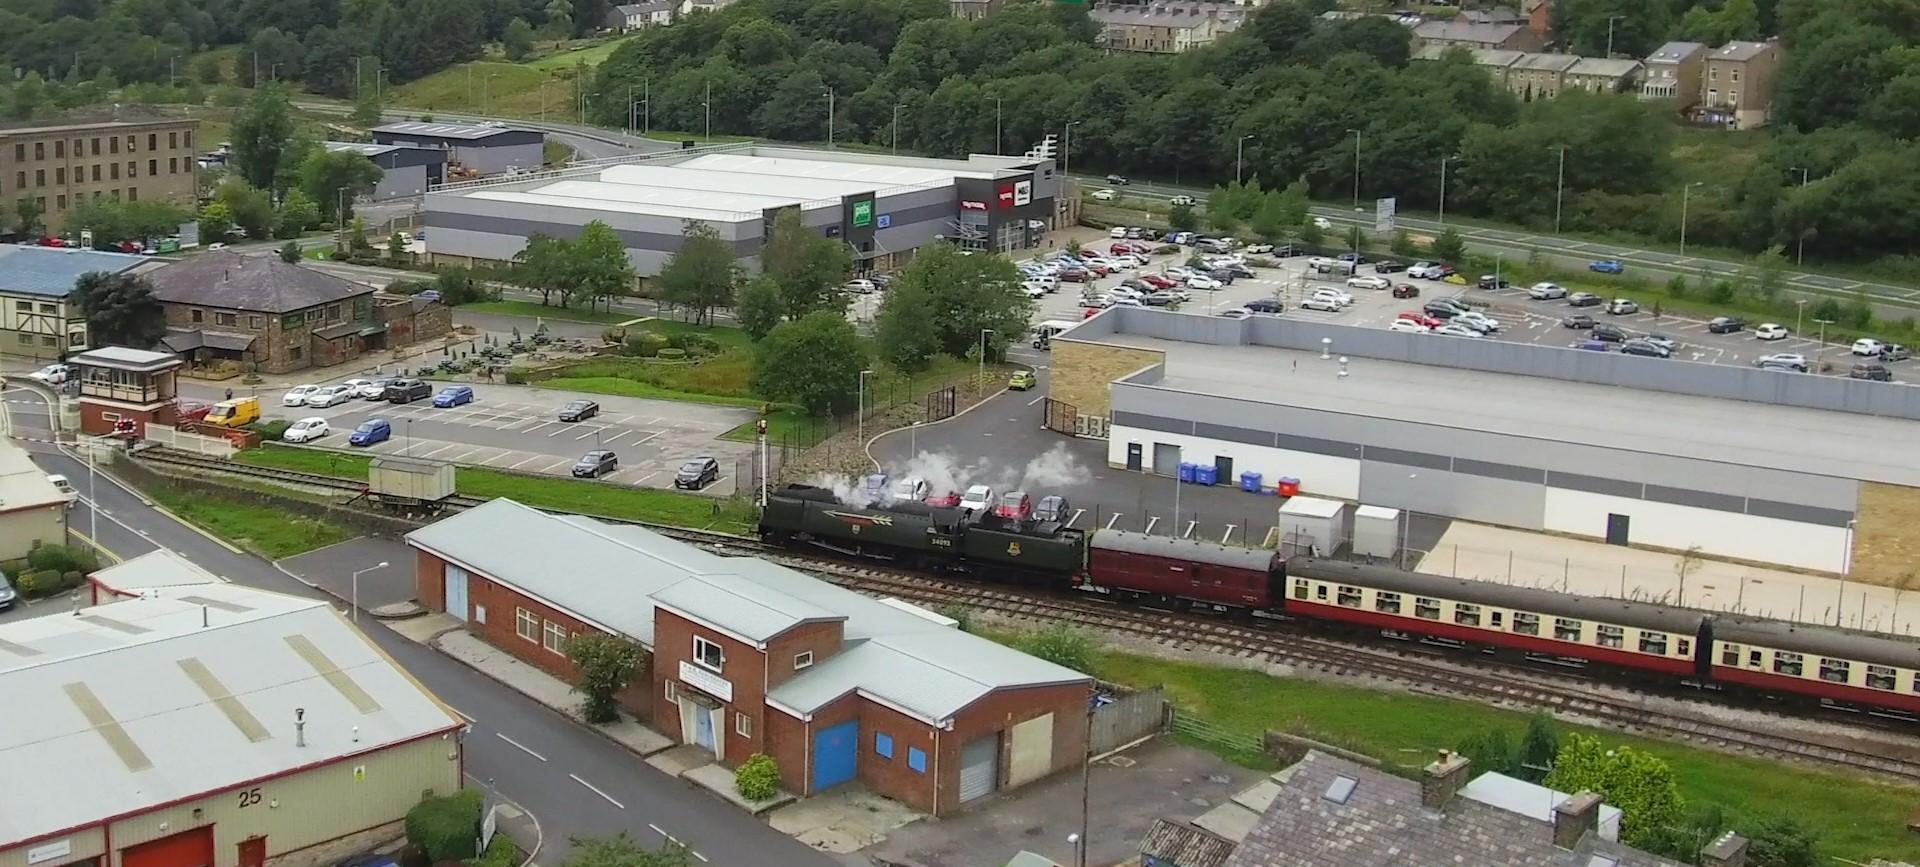 Aerial view of East Lancashire Railways